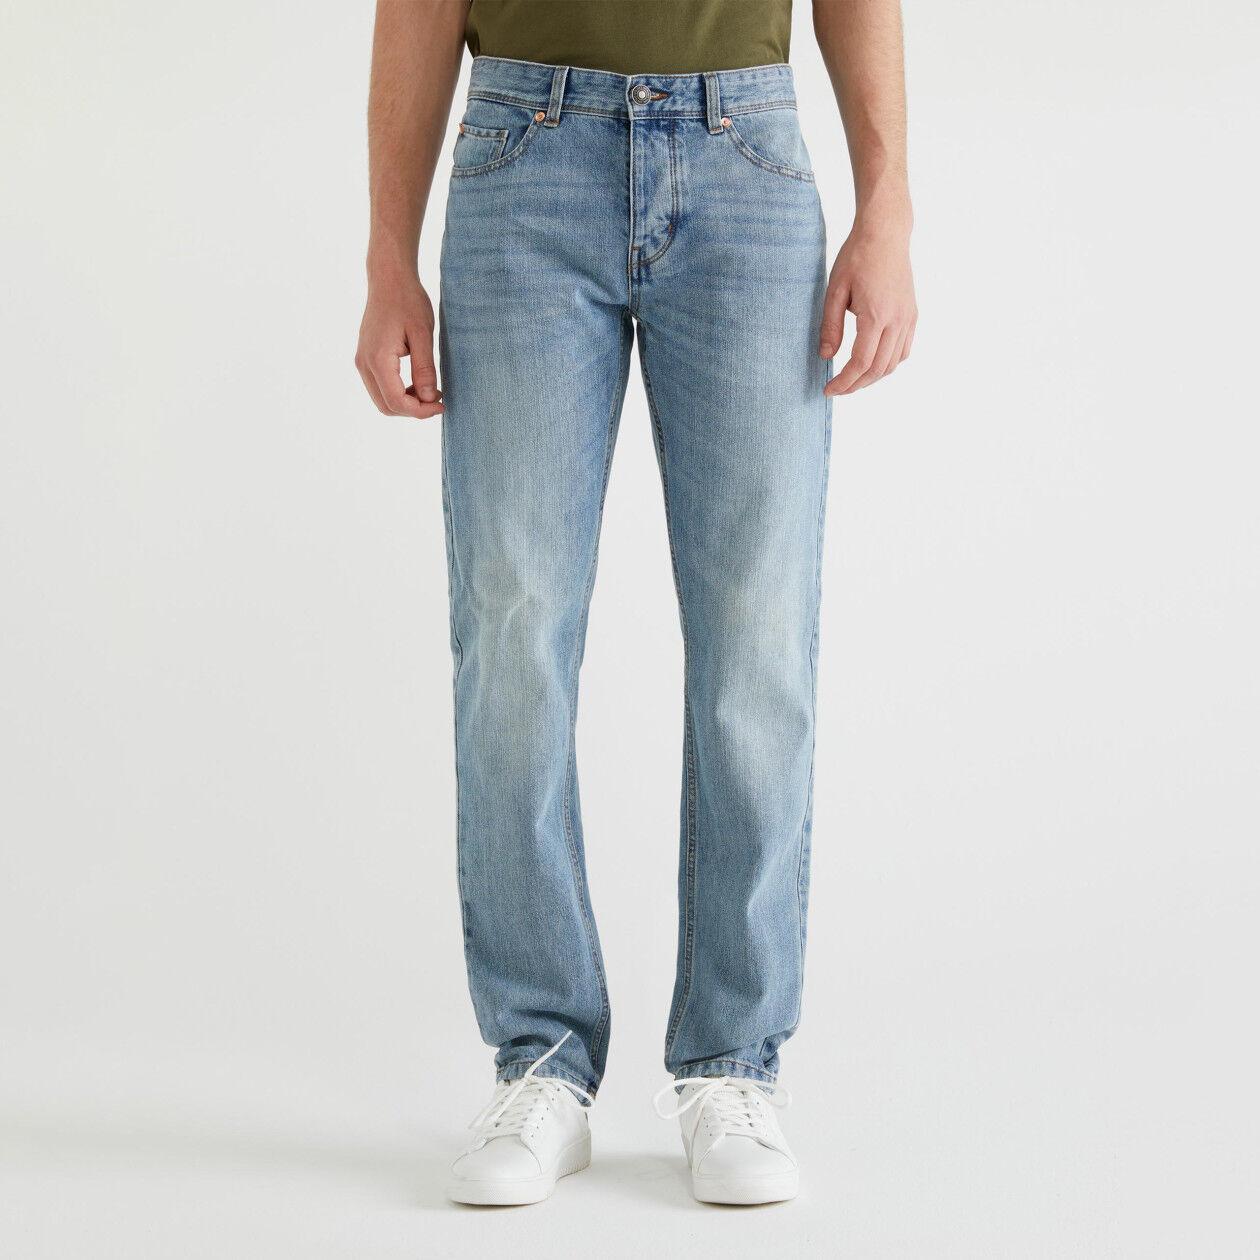 Jeans straight cinco bolsos